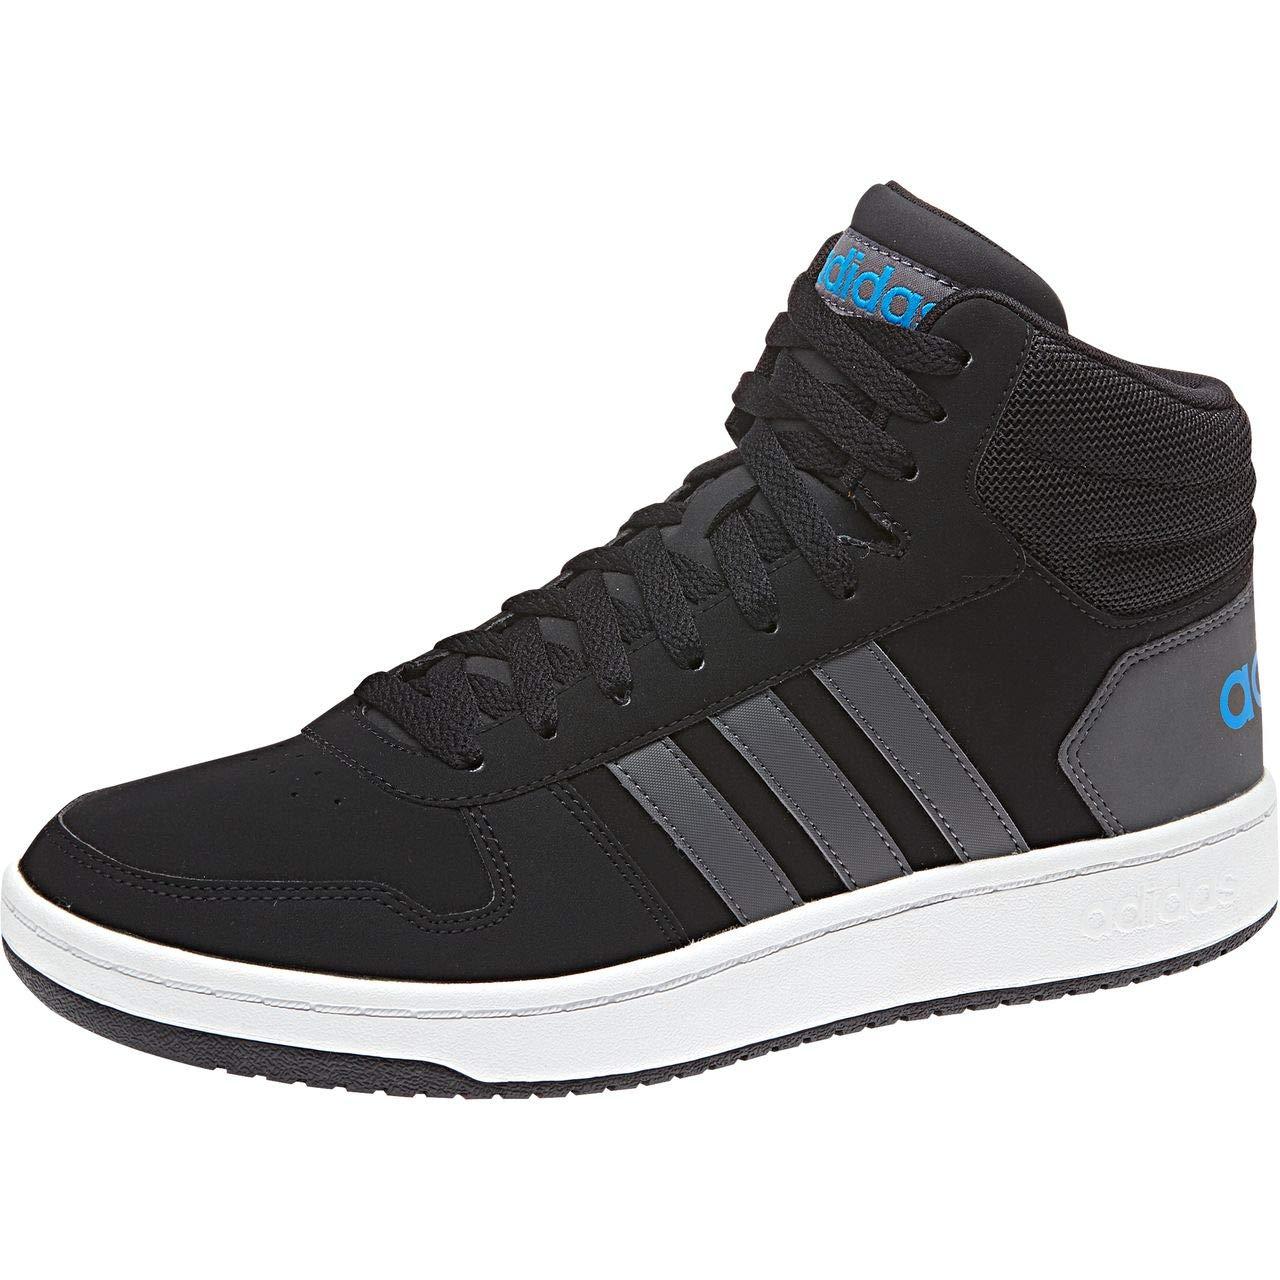 Adidas Hoops 2.0 Homme Mid, Chaussures de Basketball Homme 2.0 38 2/3 EU|Noir (Cblack/Grefiv/Brblue Cblack/Grefiv/Brblue) a6d93b